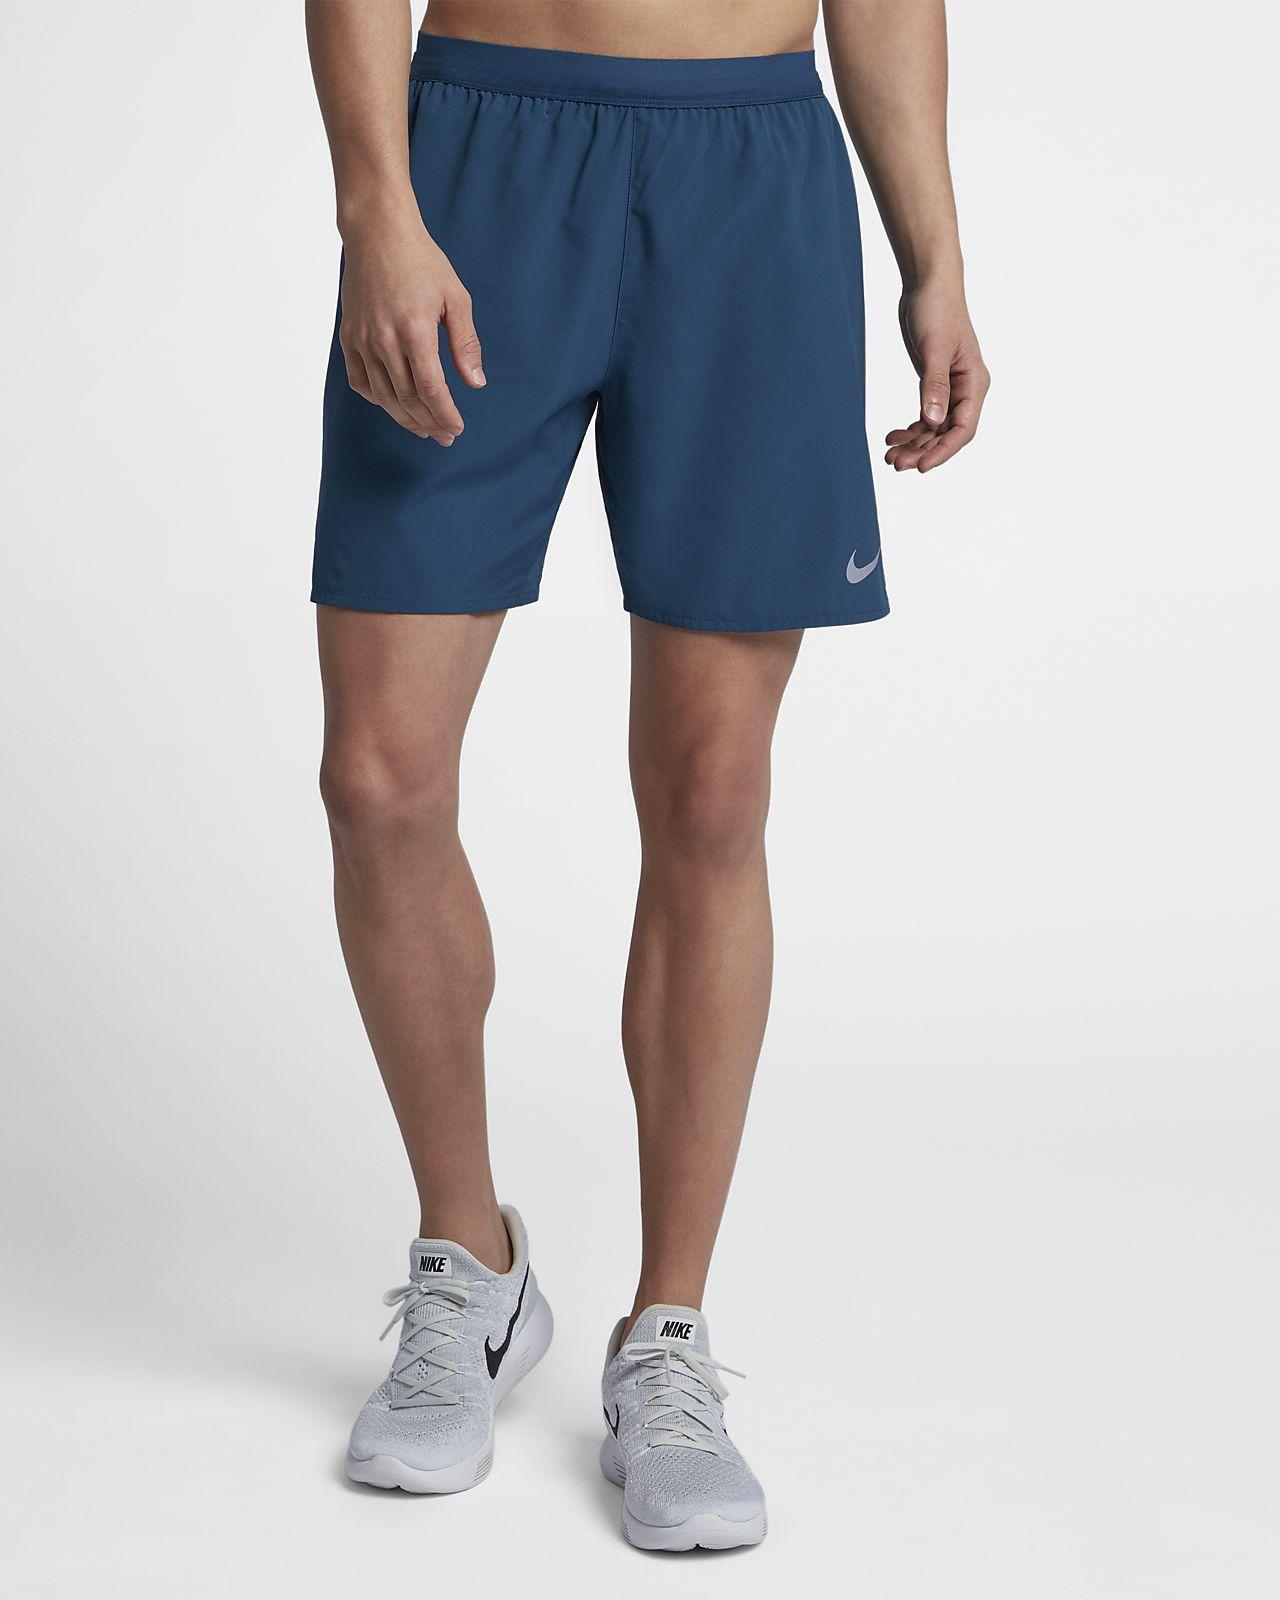 7 shorts